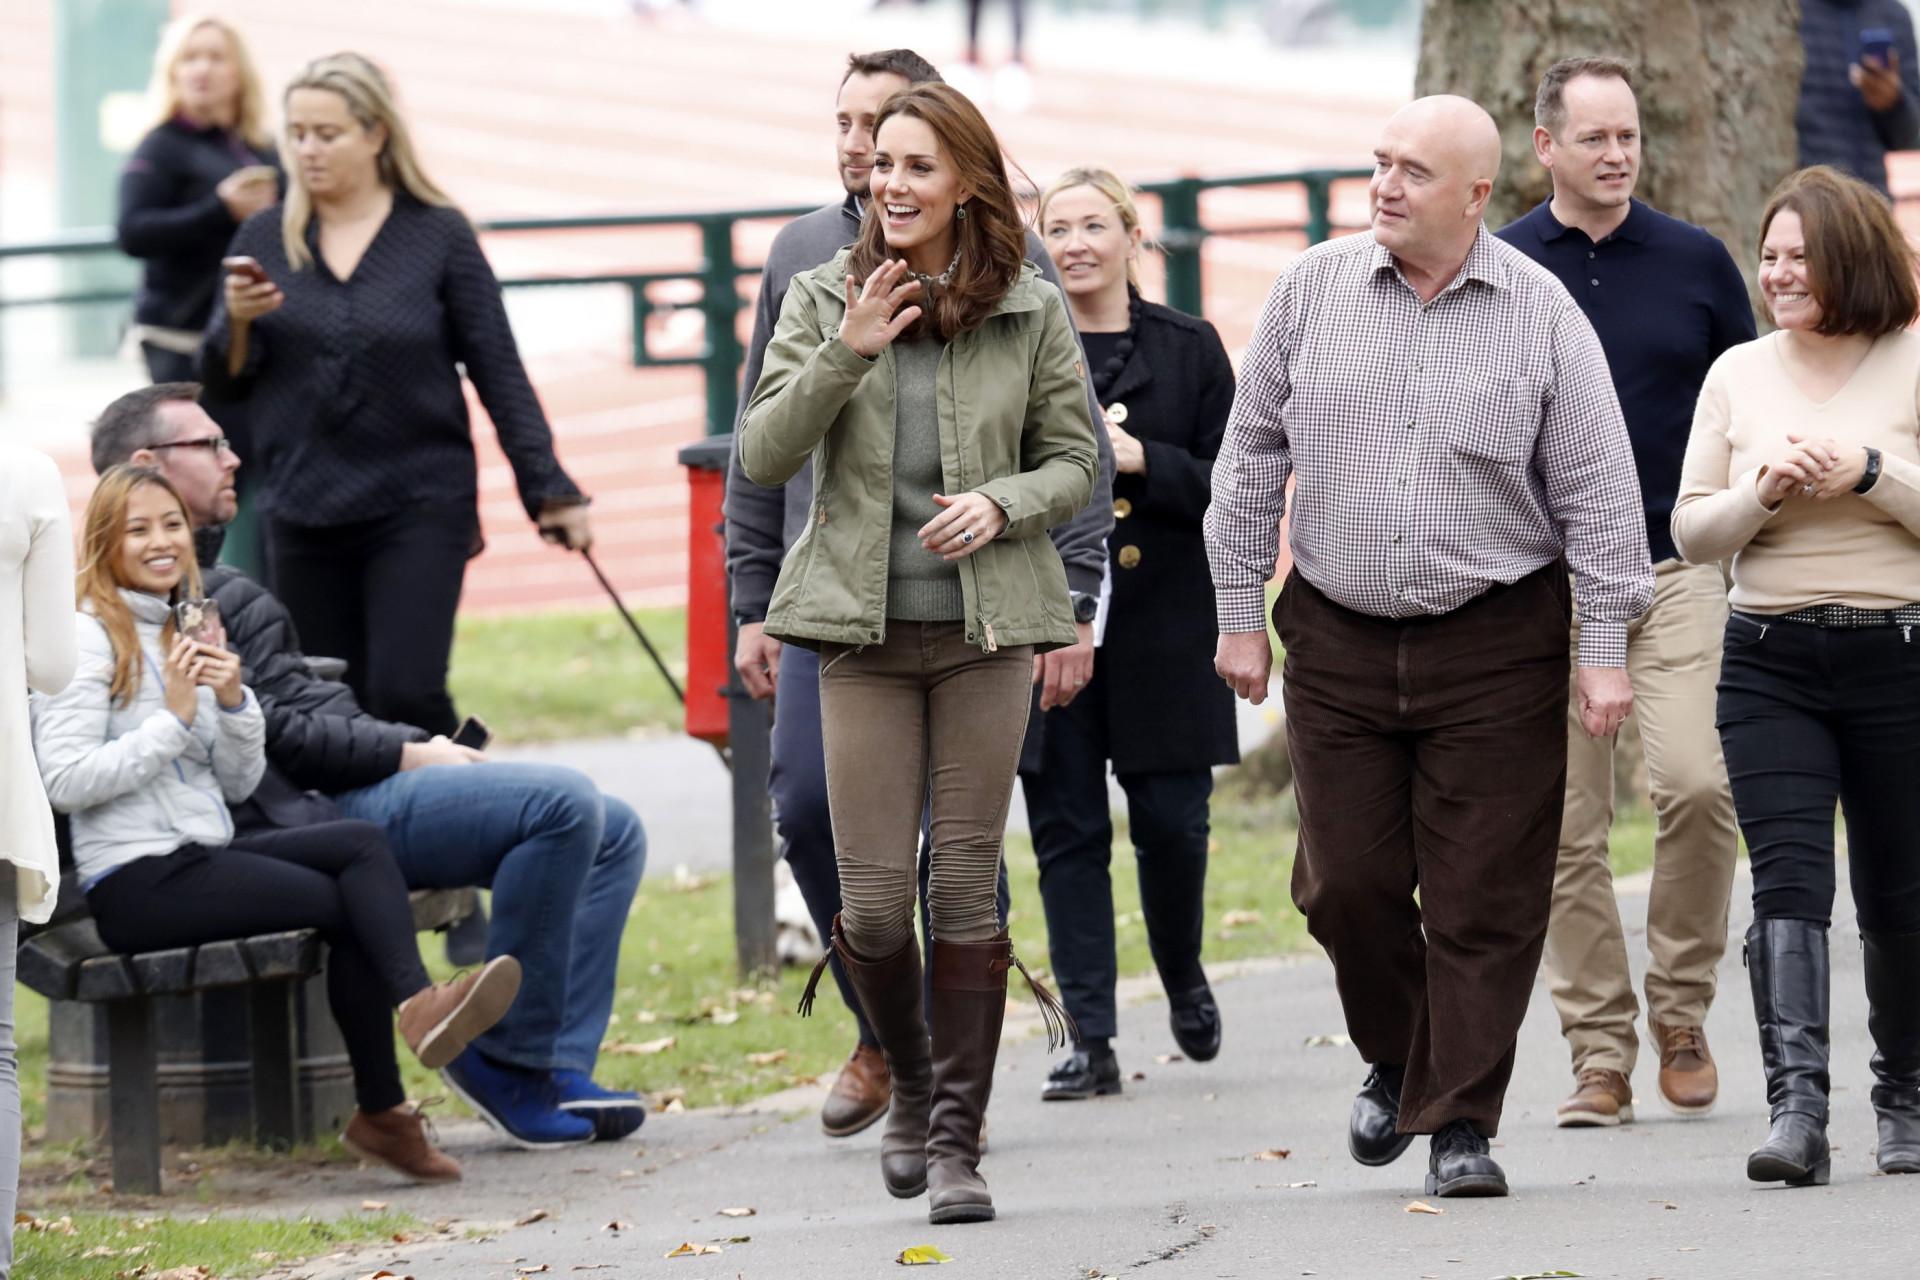 Kate Middleton usa look descontraído em compromisso público